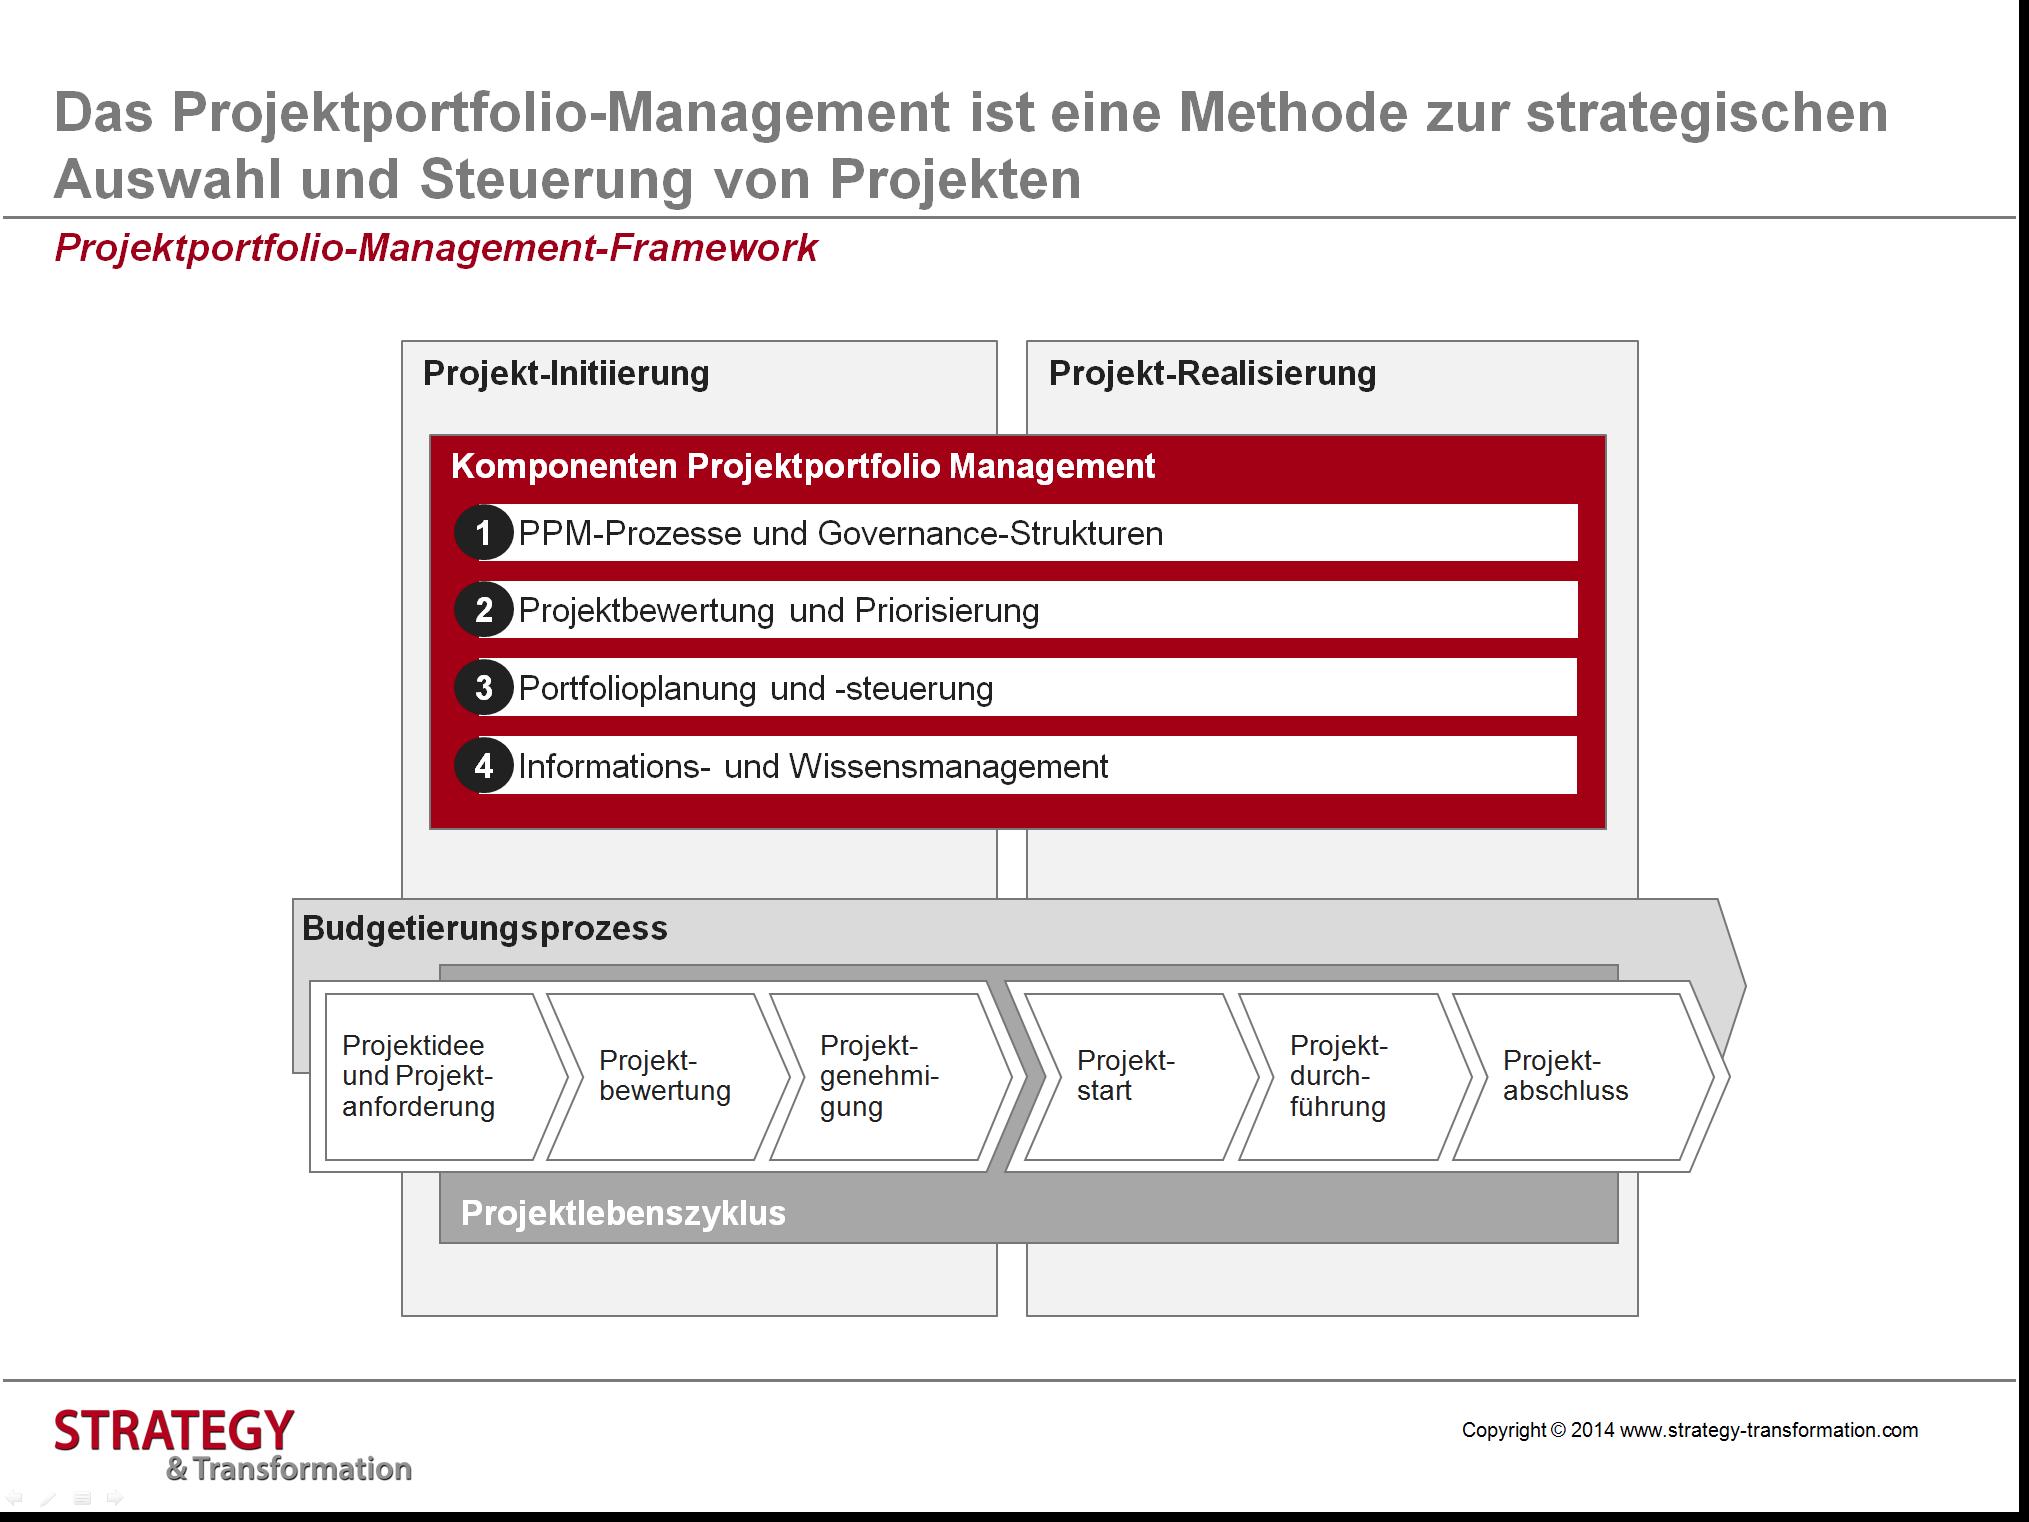 Grafik 4_Projektportfolio-Management-Framework